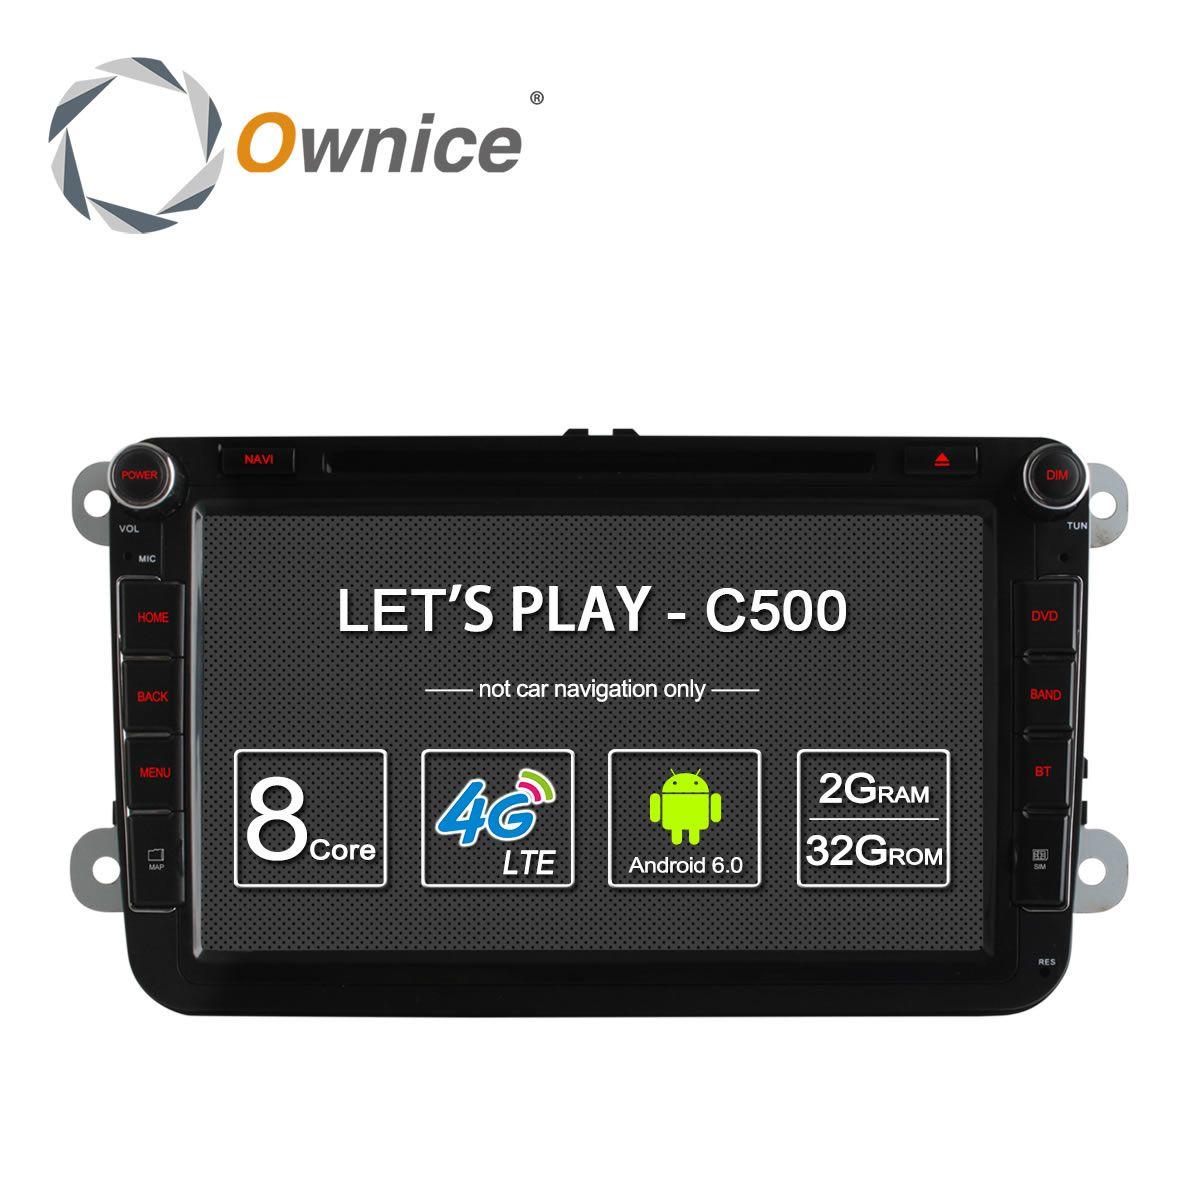 4G SIM LTE Network Ownice C500 Octa 8 Core Android 6.0 2G RAM 2 Din Car DVD GPS Navi Radio Player For VW Skoda Octavia 2